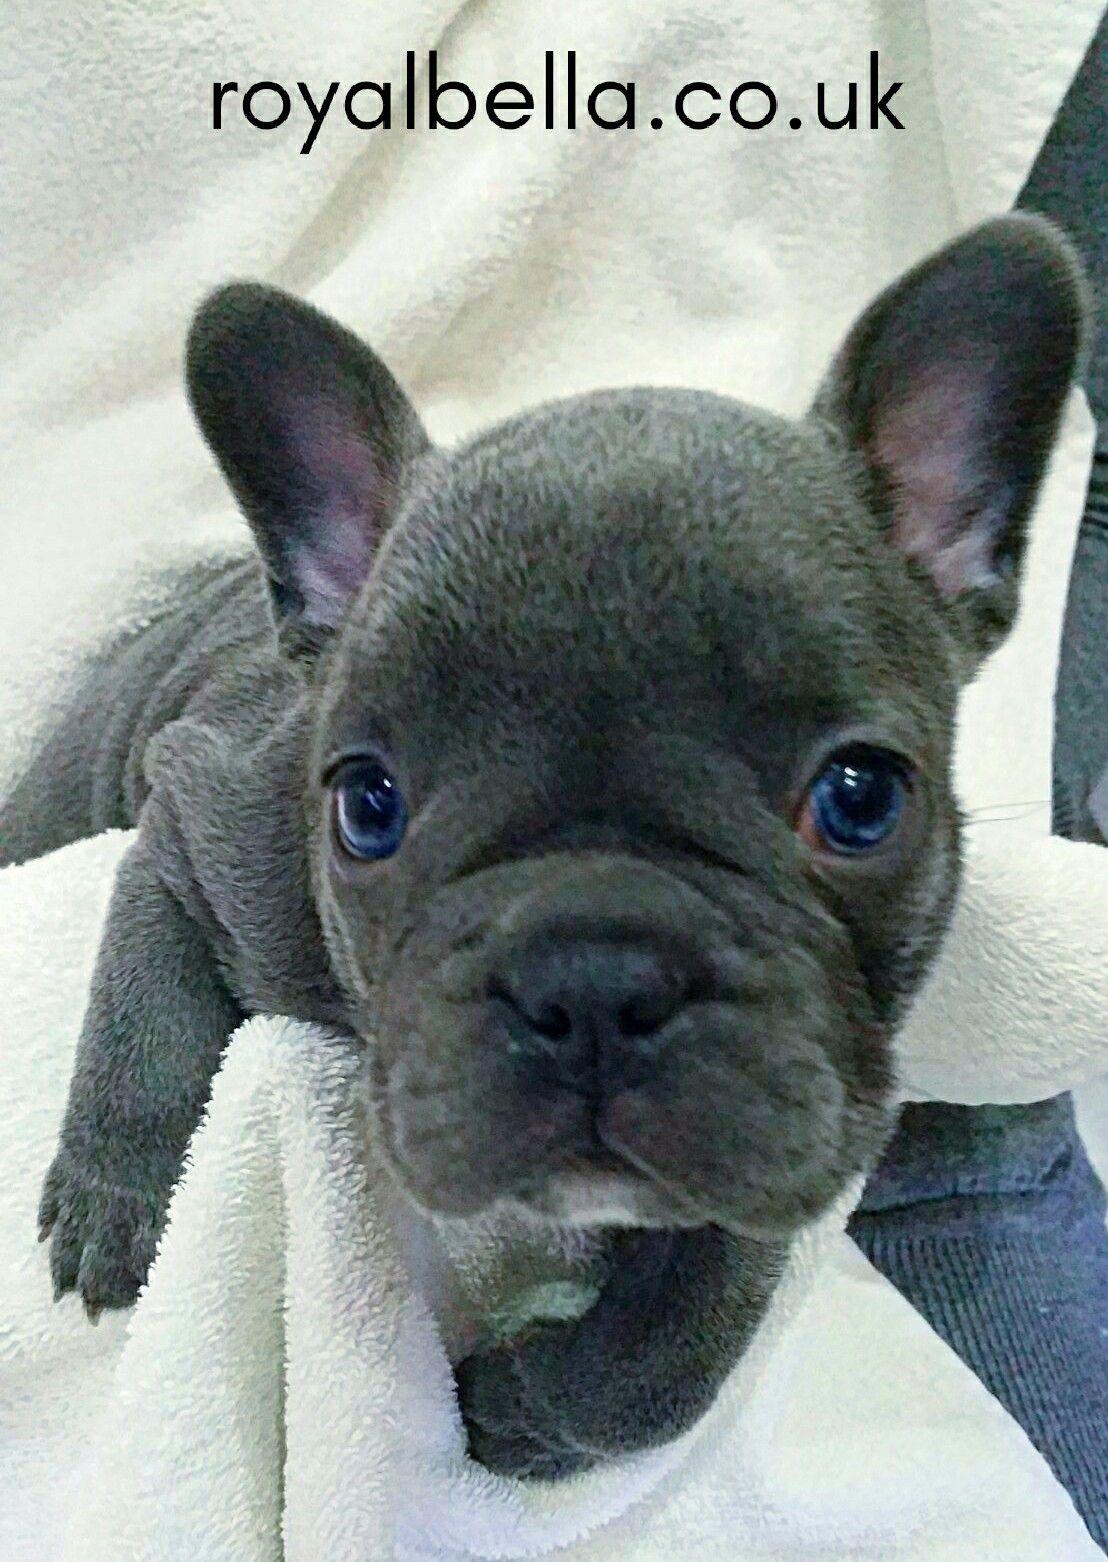 French Bulldog puppy by royalbella.co.uk The French